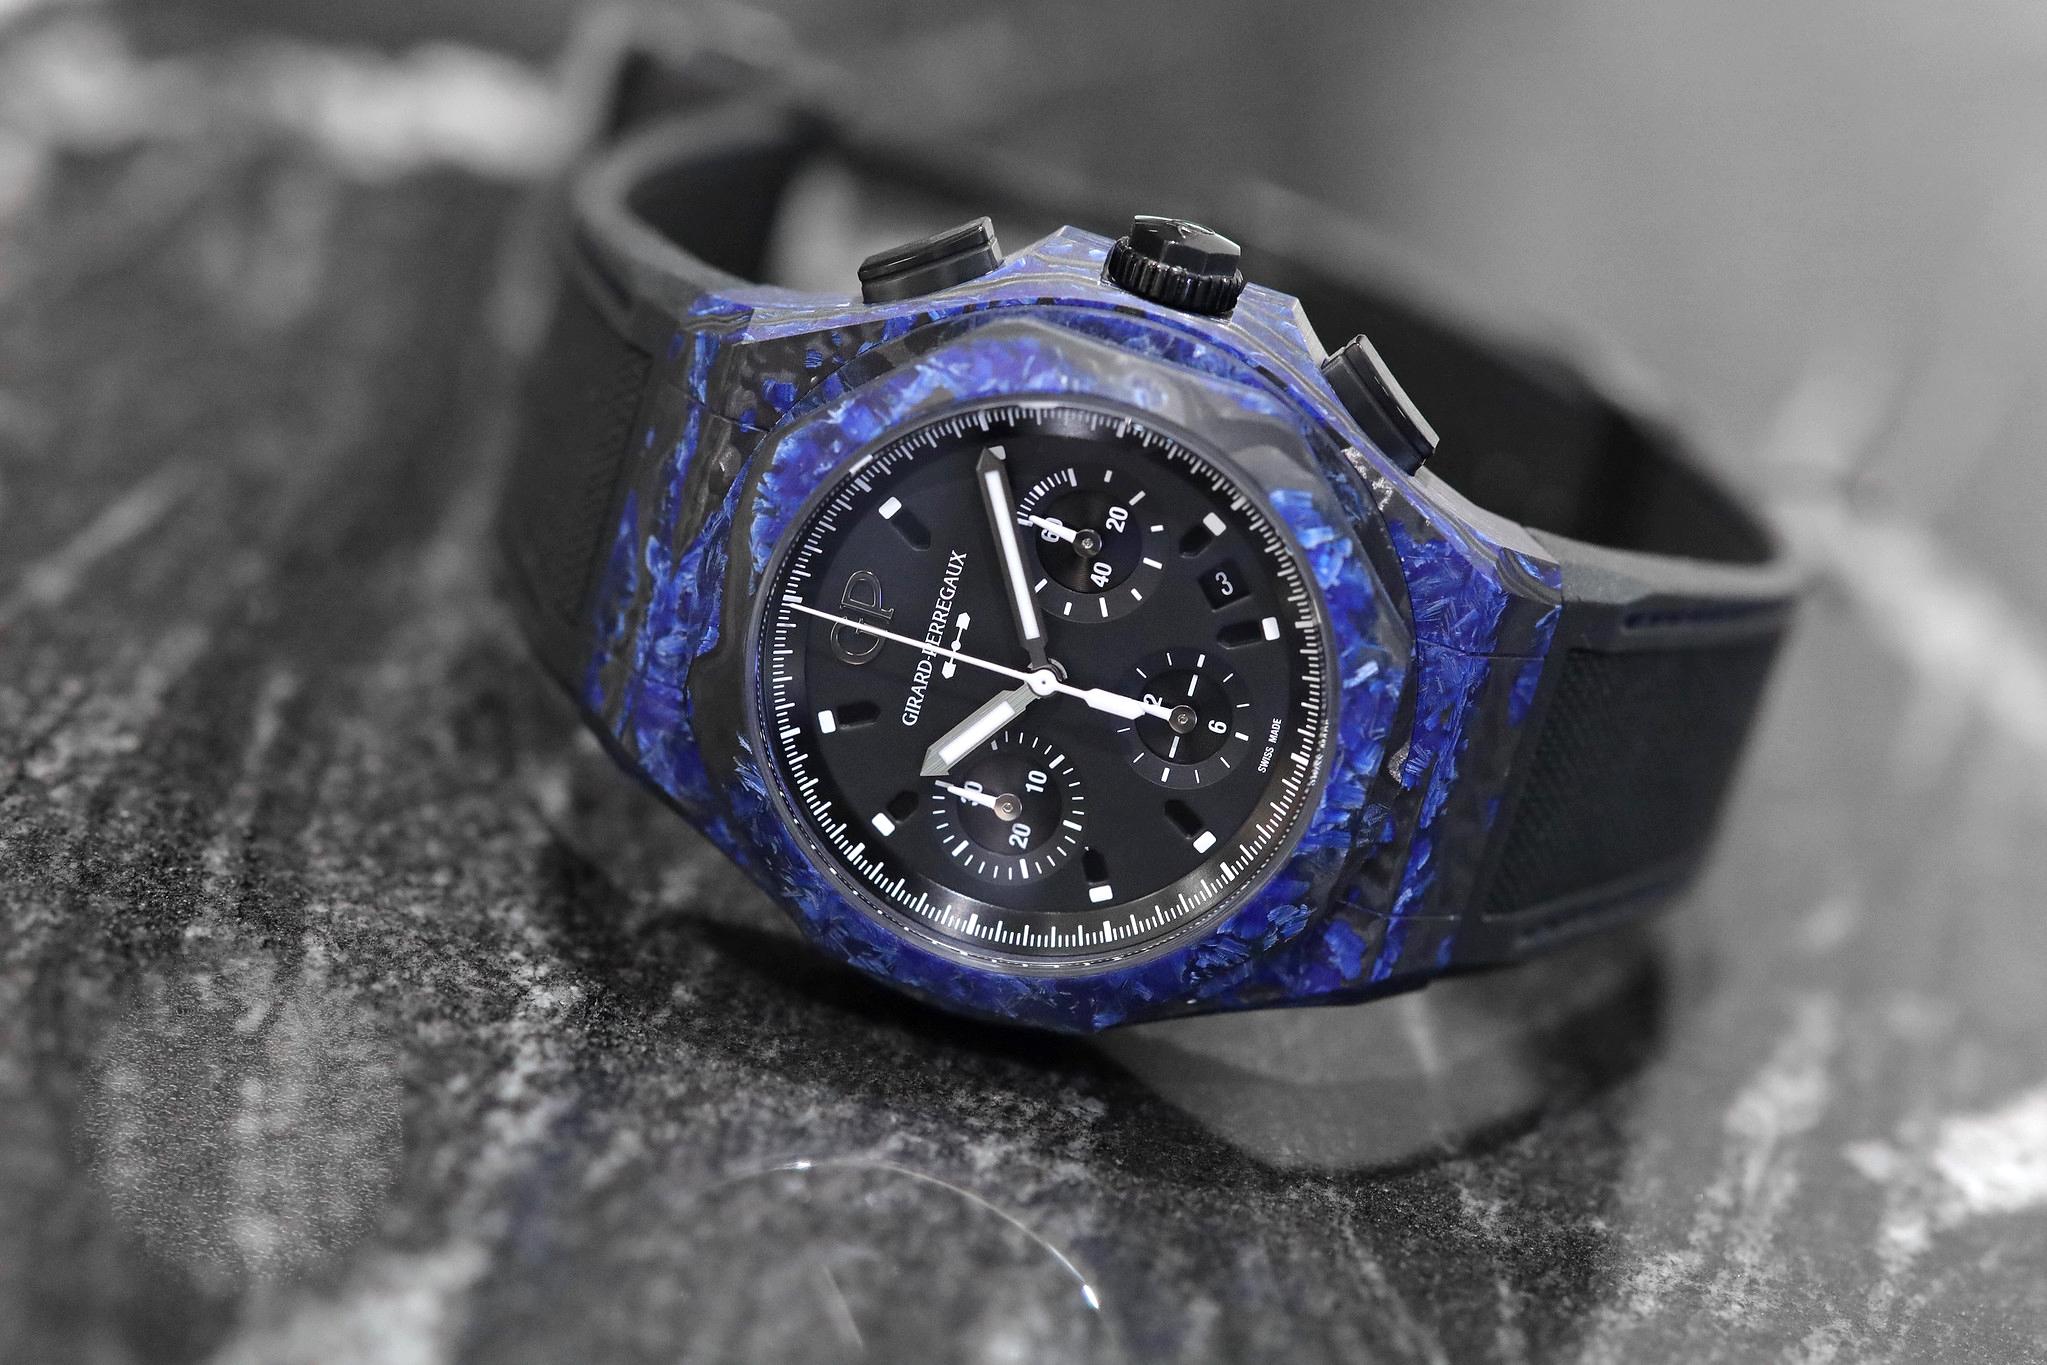 Girard-Perregaux Carbon Glass Laureato Absolute Chronograph